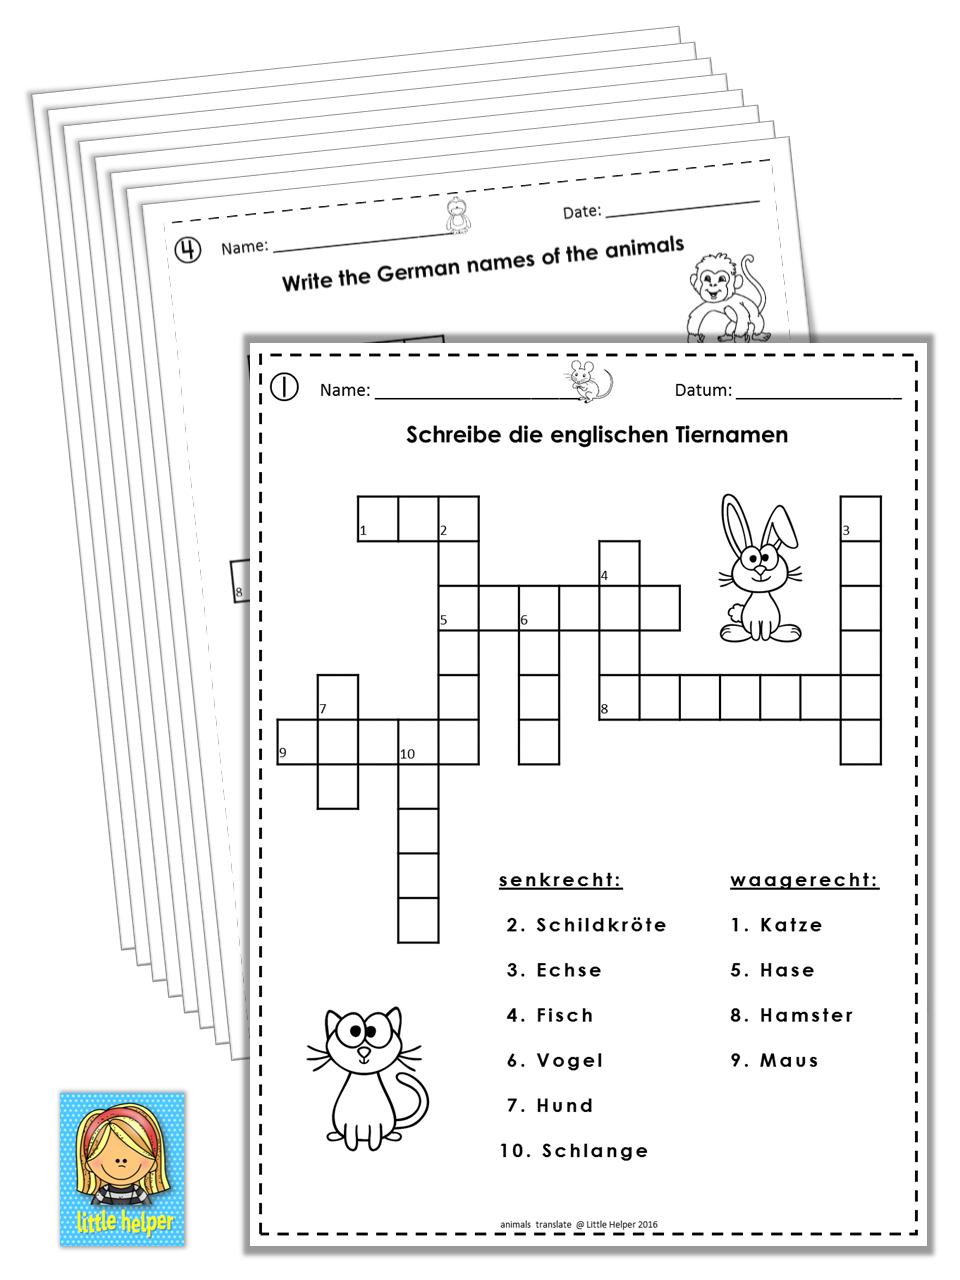 German/english Crossword Puzzles Tiere/animals   German Words - Printable German Crosswords